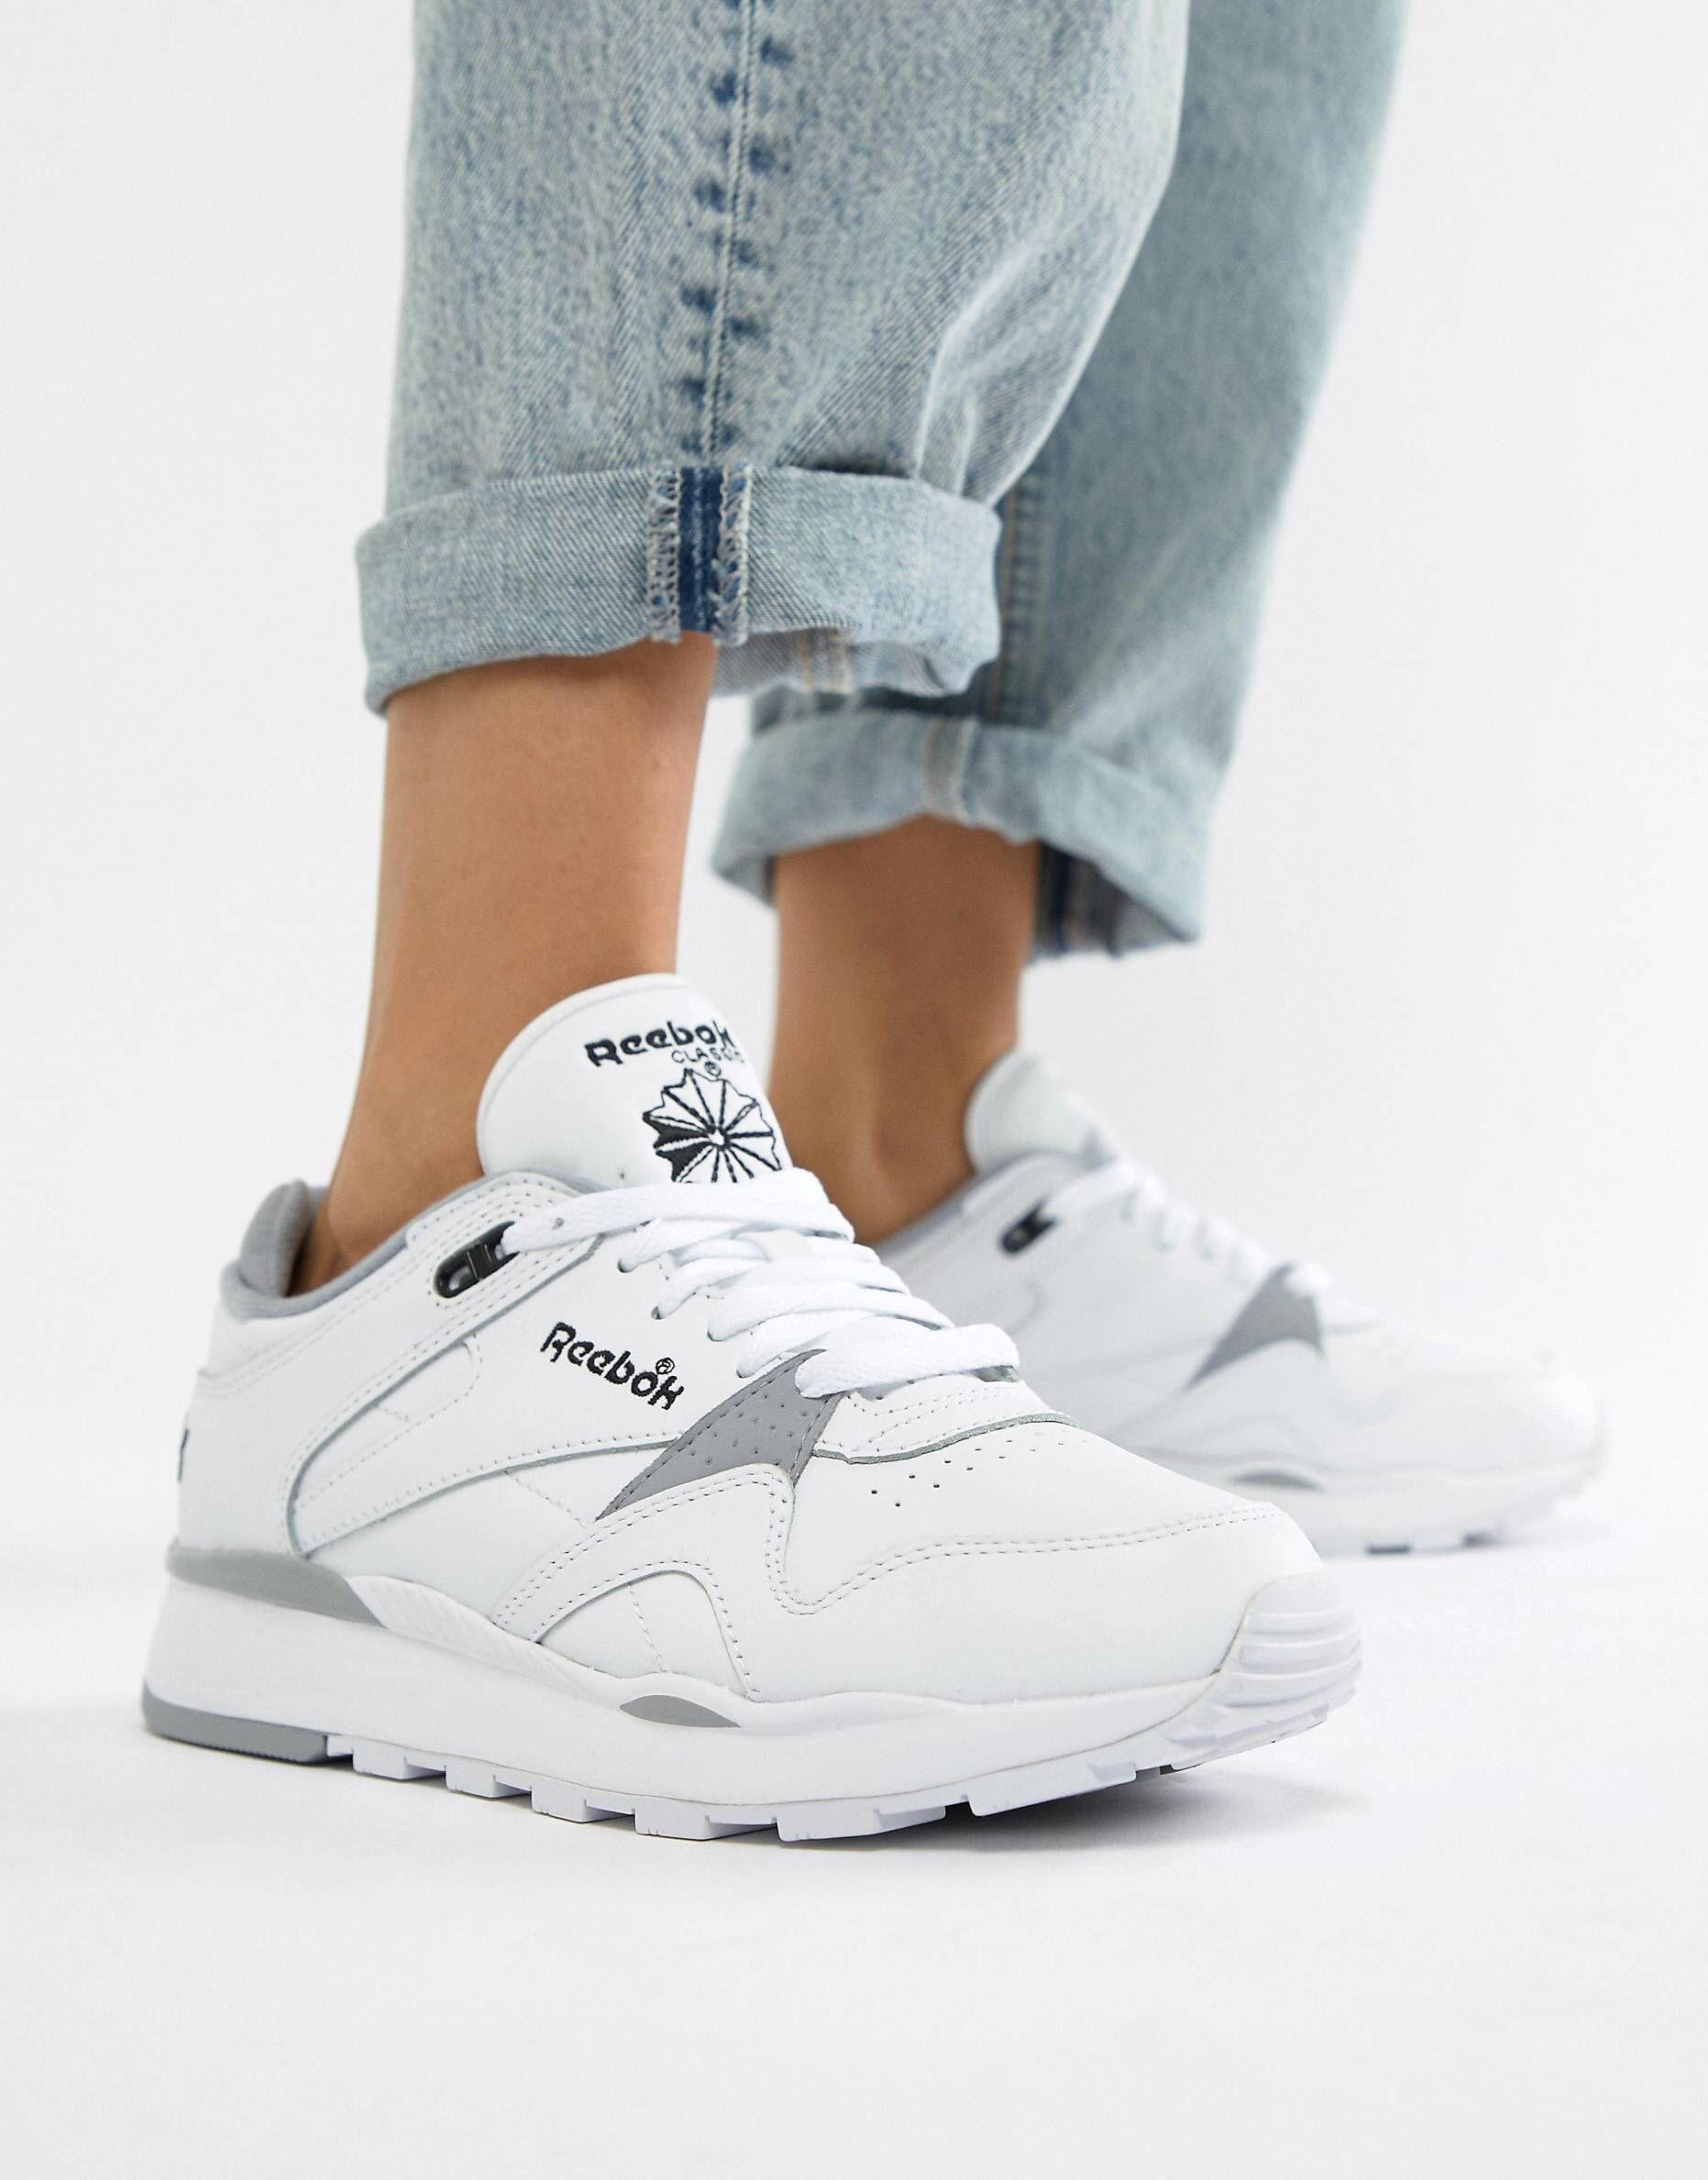 Reebok Sneakers For Mens : Reebok for Sale Reebok Outlet